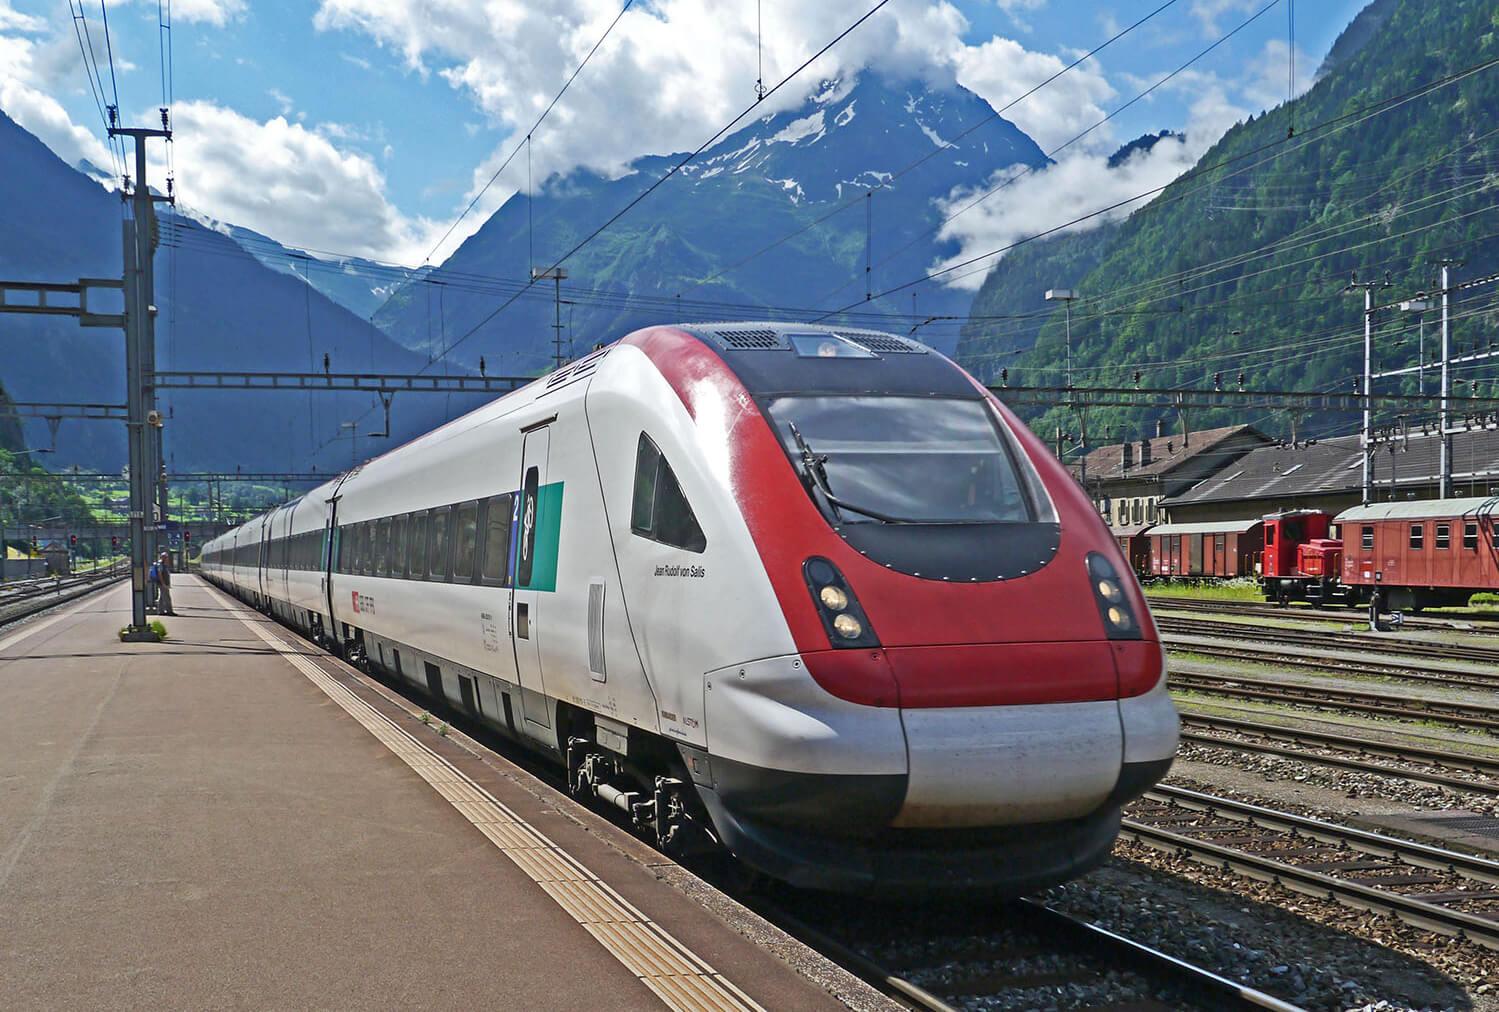 Amtrak & Railway